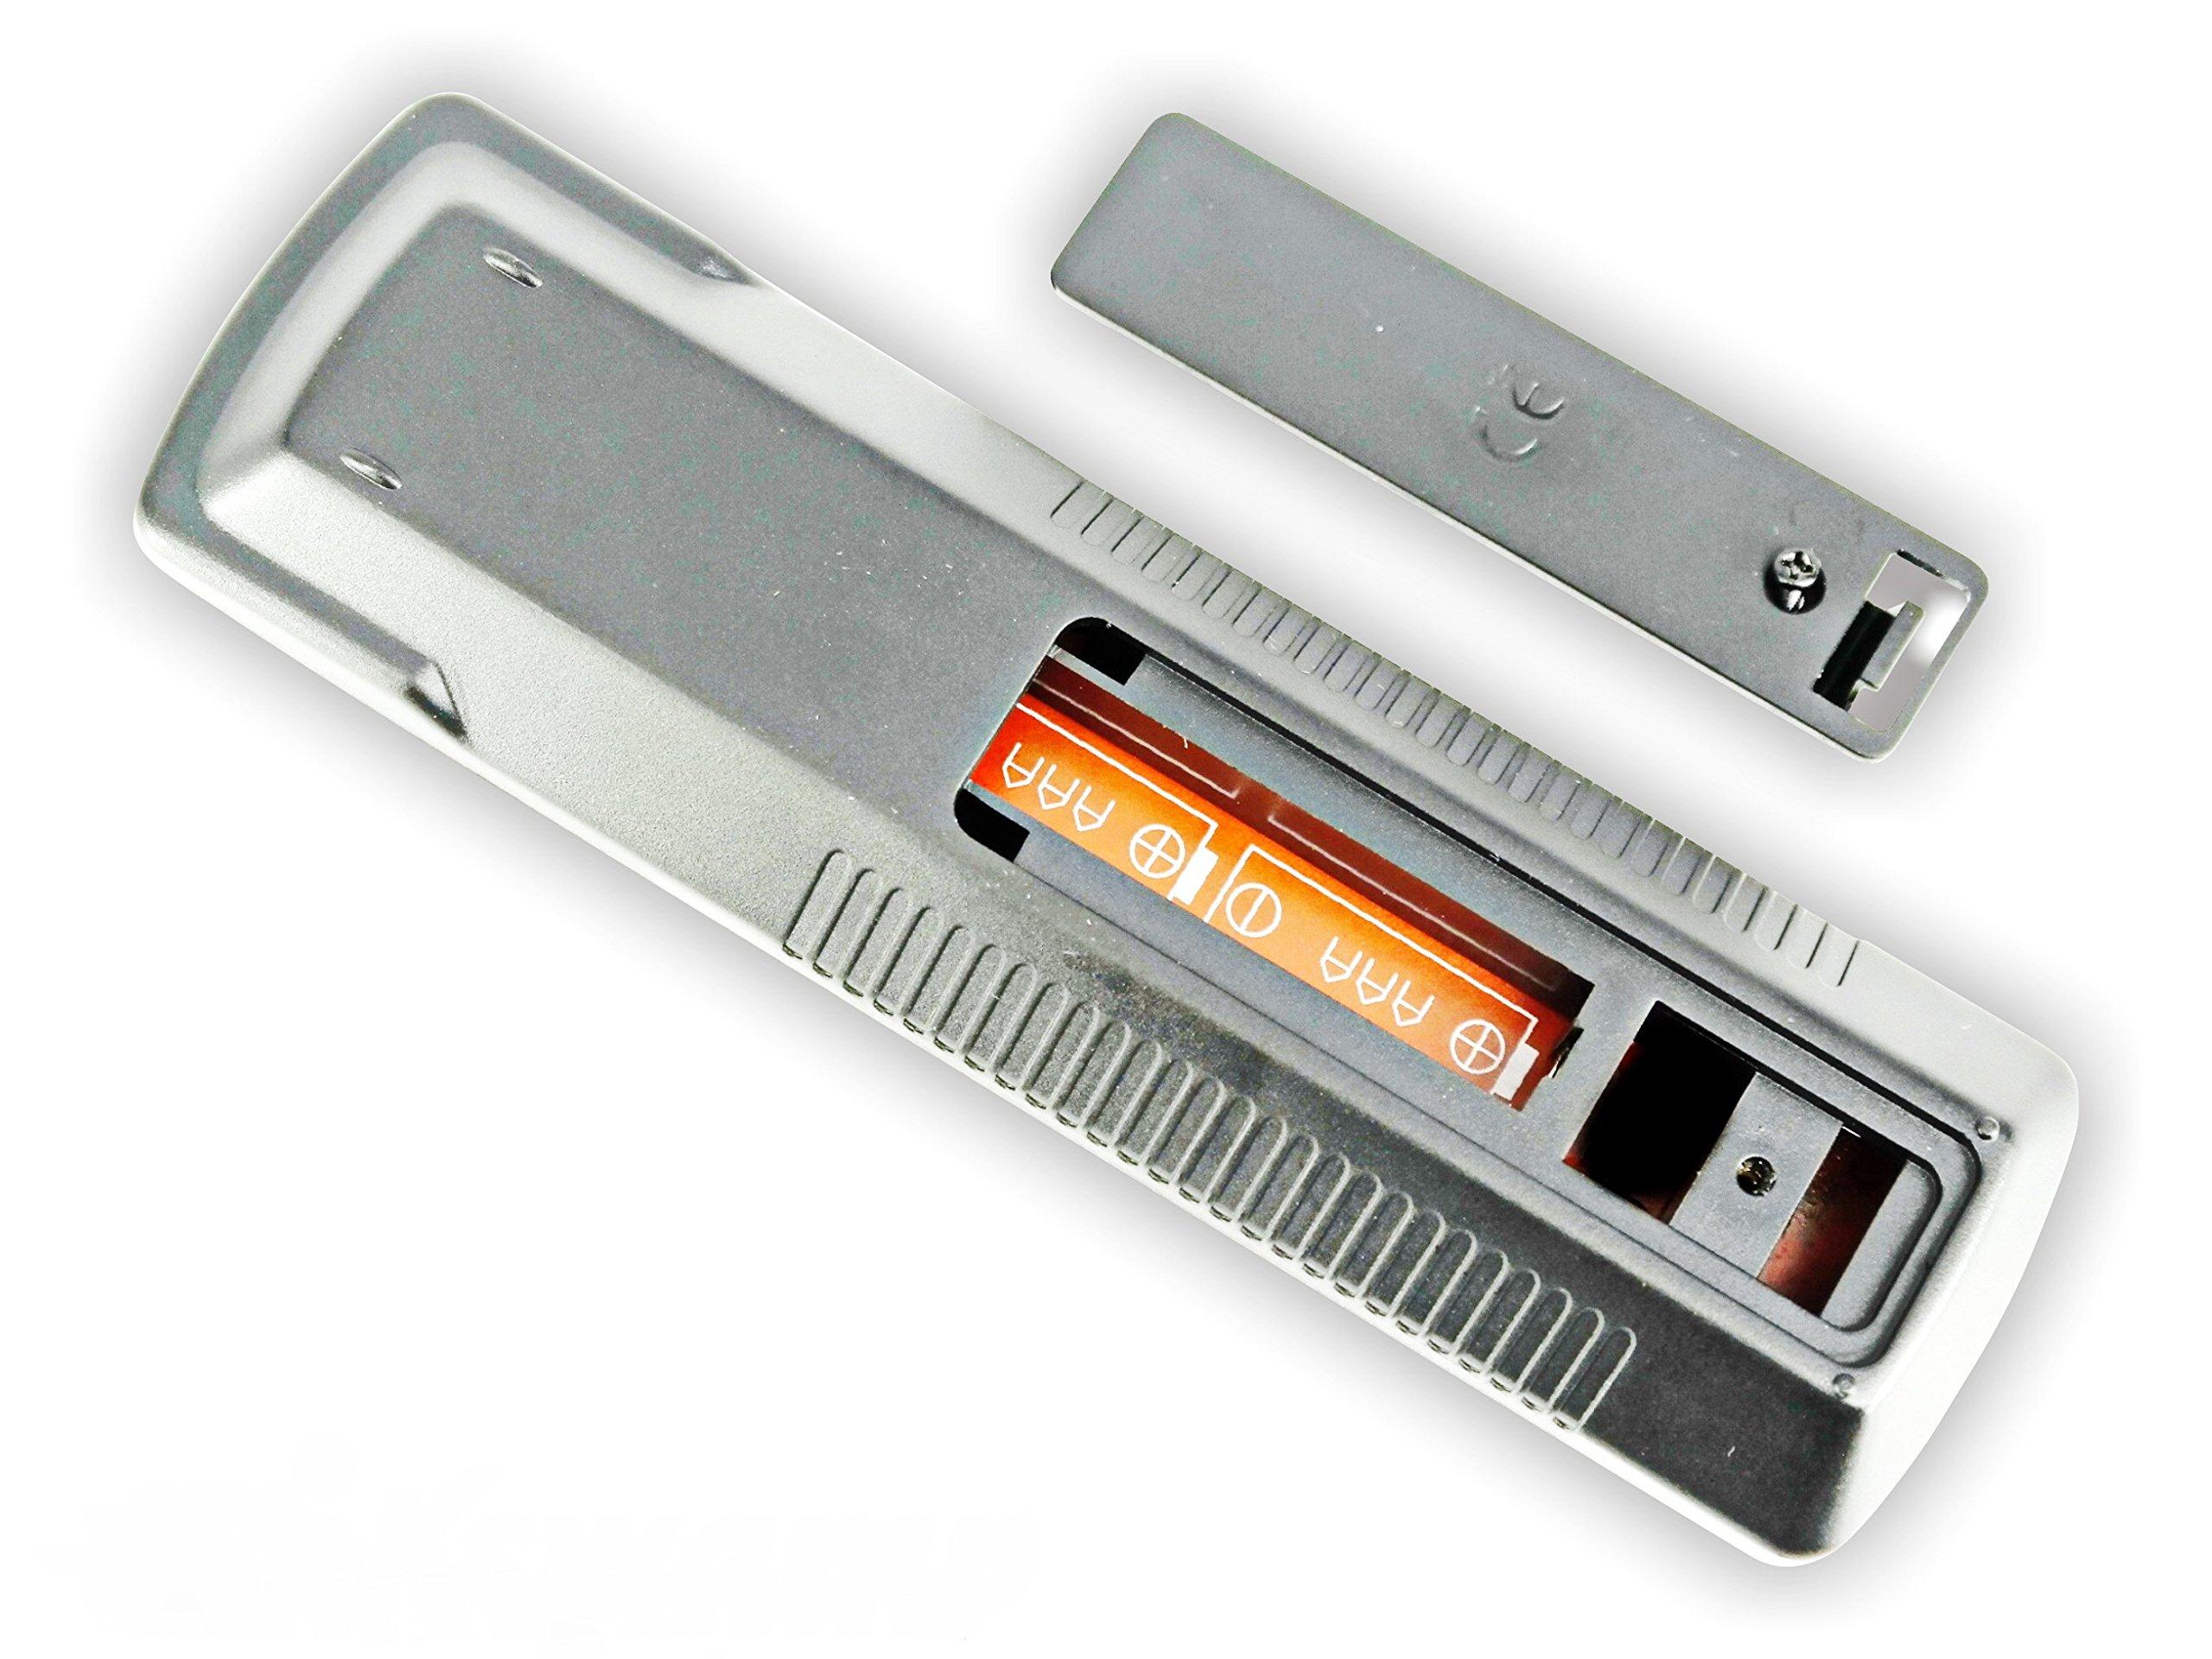 Remote Control for Samsung HT-DS100 by Tekswamp by Tekswamp (Image #7)